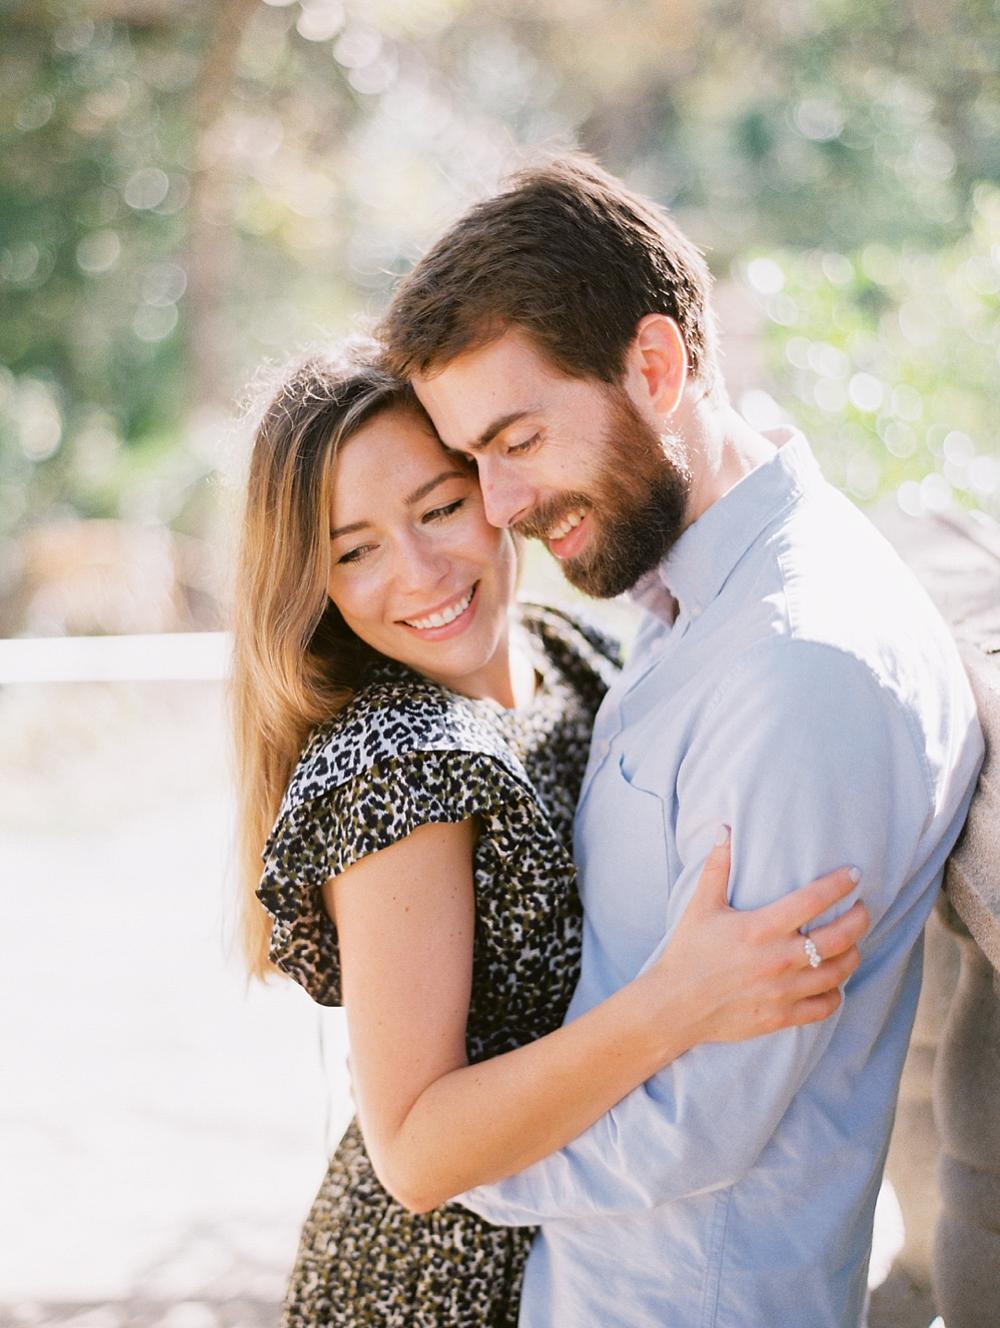 kristin-la-voie-photography-Austin-Wedding-Photographer-laguna-gloria-commodore-perry-estate-engagement-106